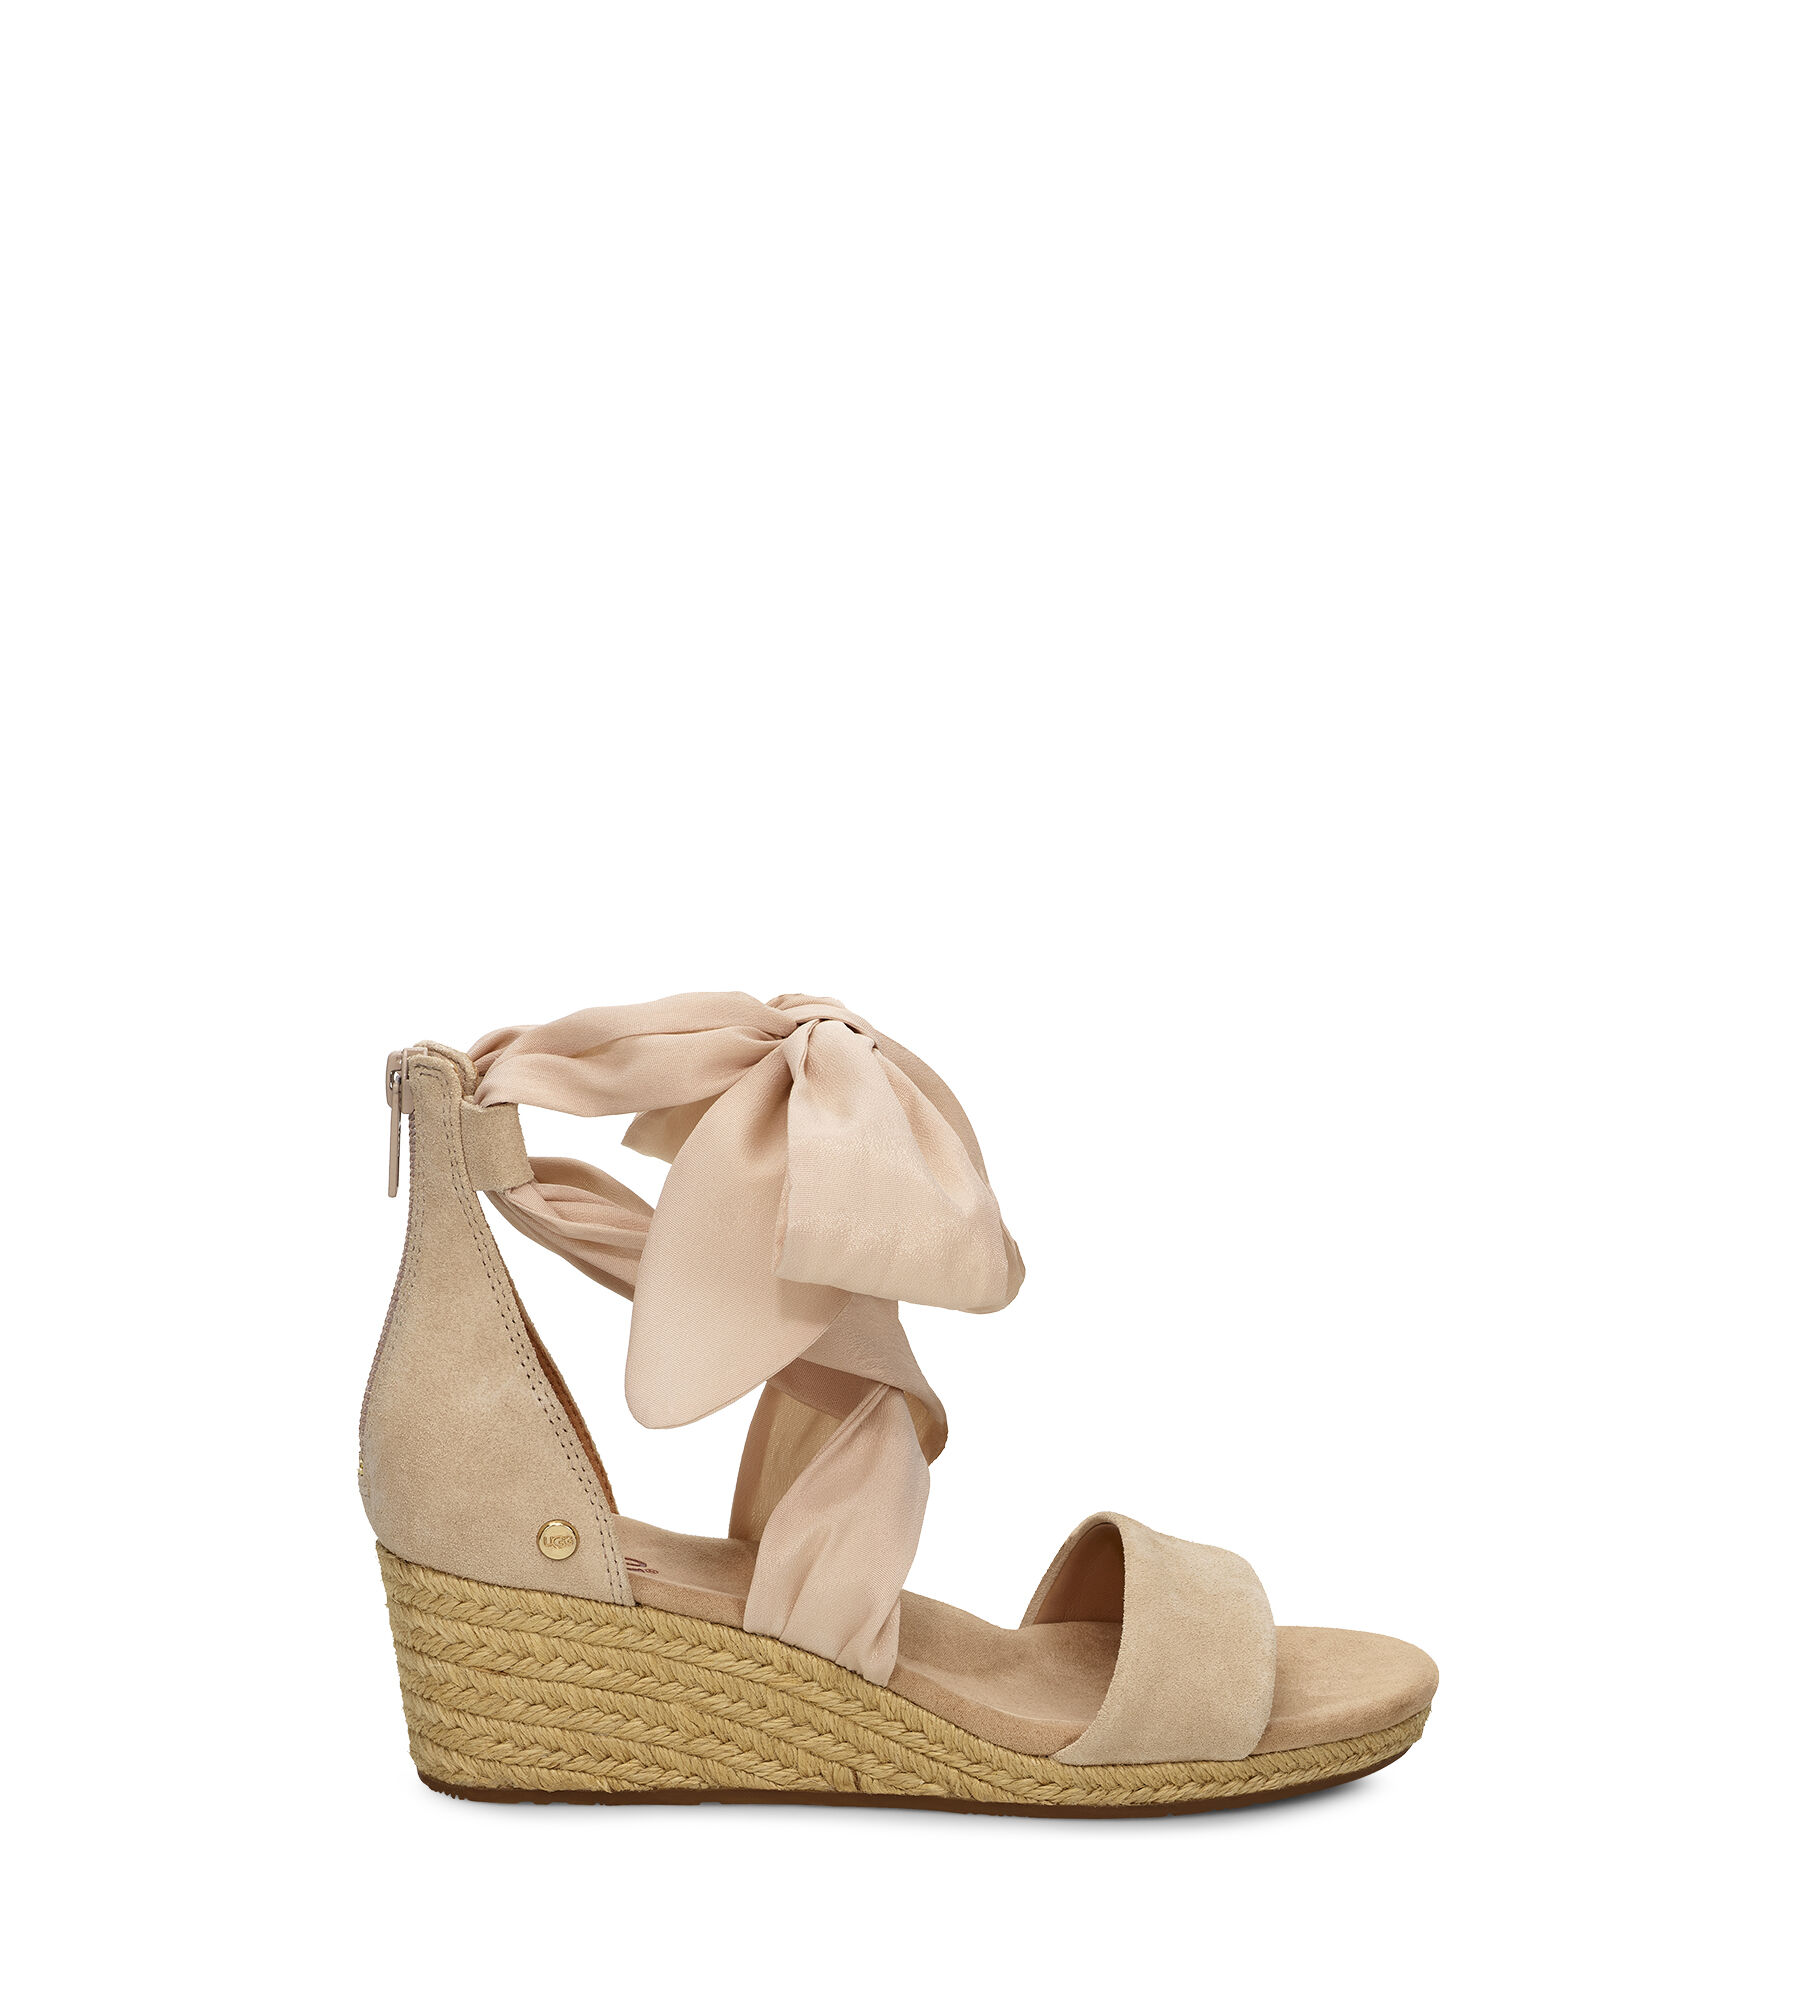 Official SandalsSlidesamp; Official Women's PlatformsUgg® PlatformsUgg® SandalsSlidesamp; PlatformsUgg® SandalsSlidesamp; Women's Women's zSUMVpqG